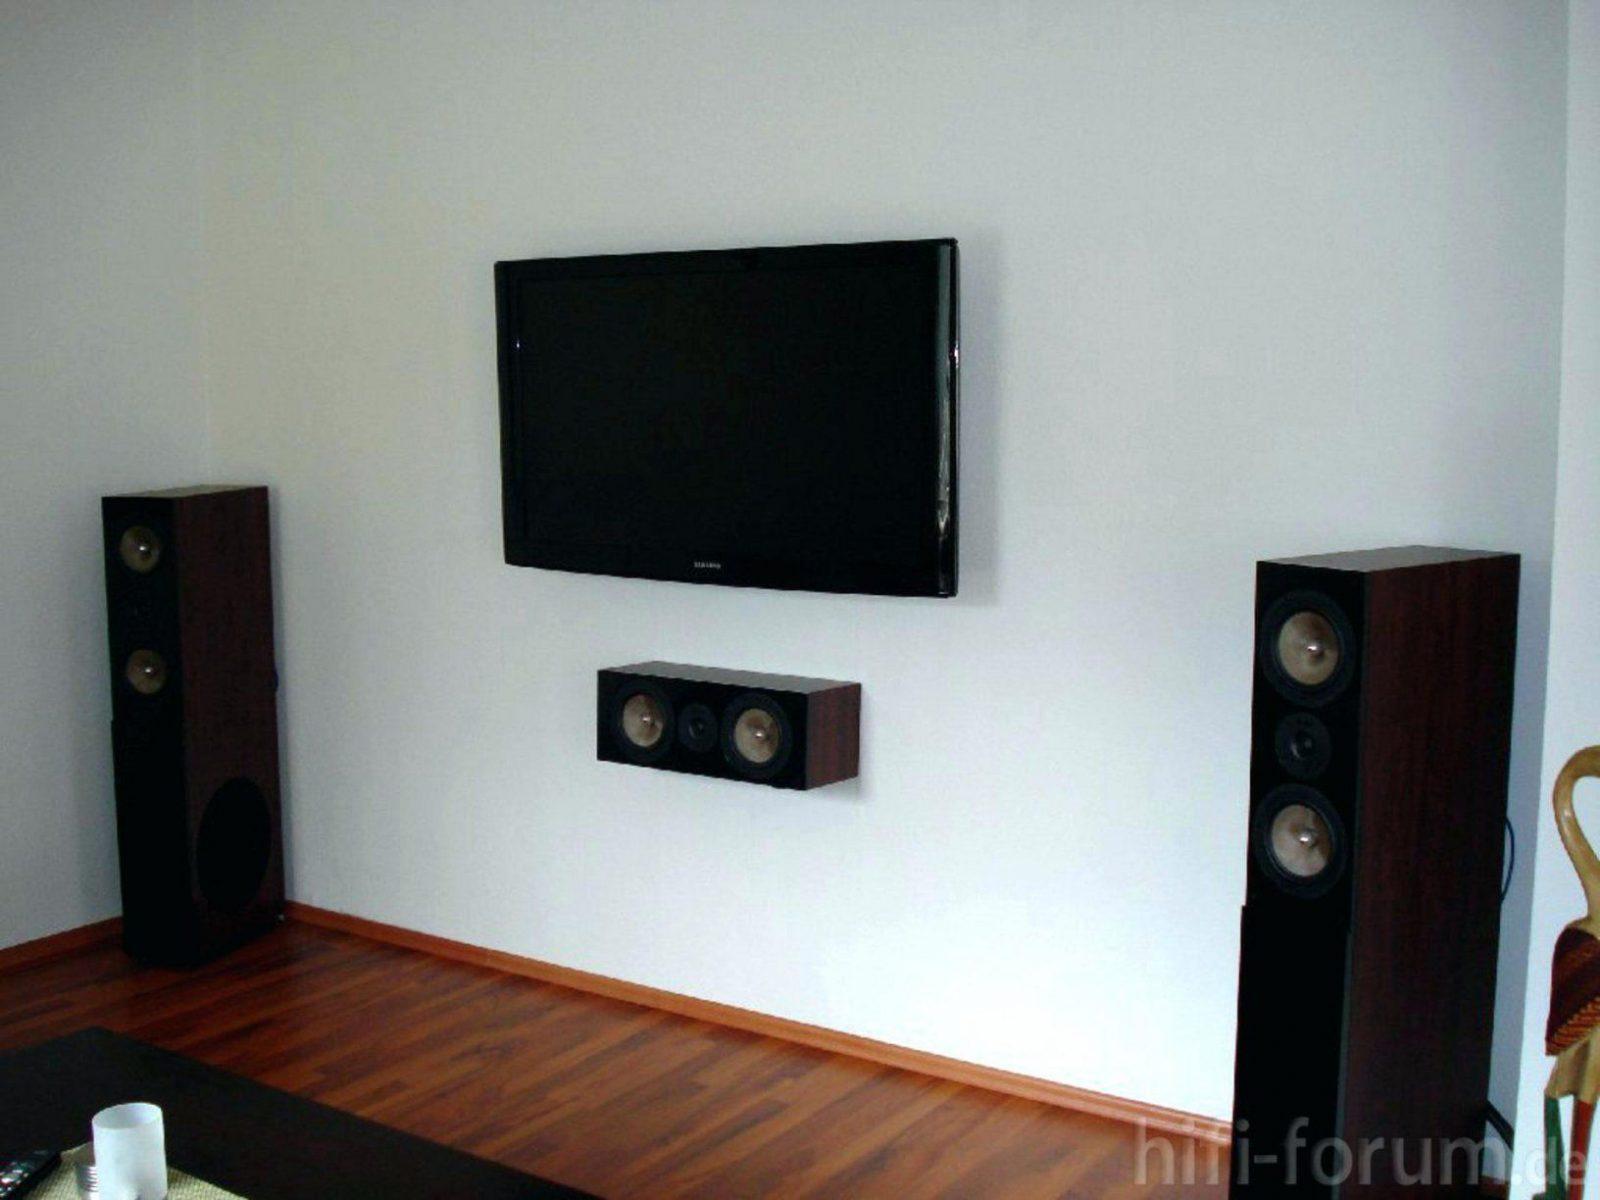 Wand tv kabel verstecken haus design ideen - Kabel wand verstecken ...